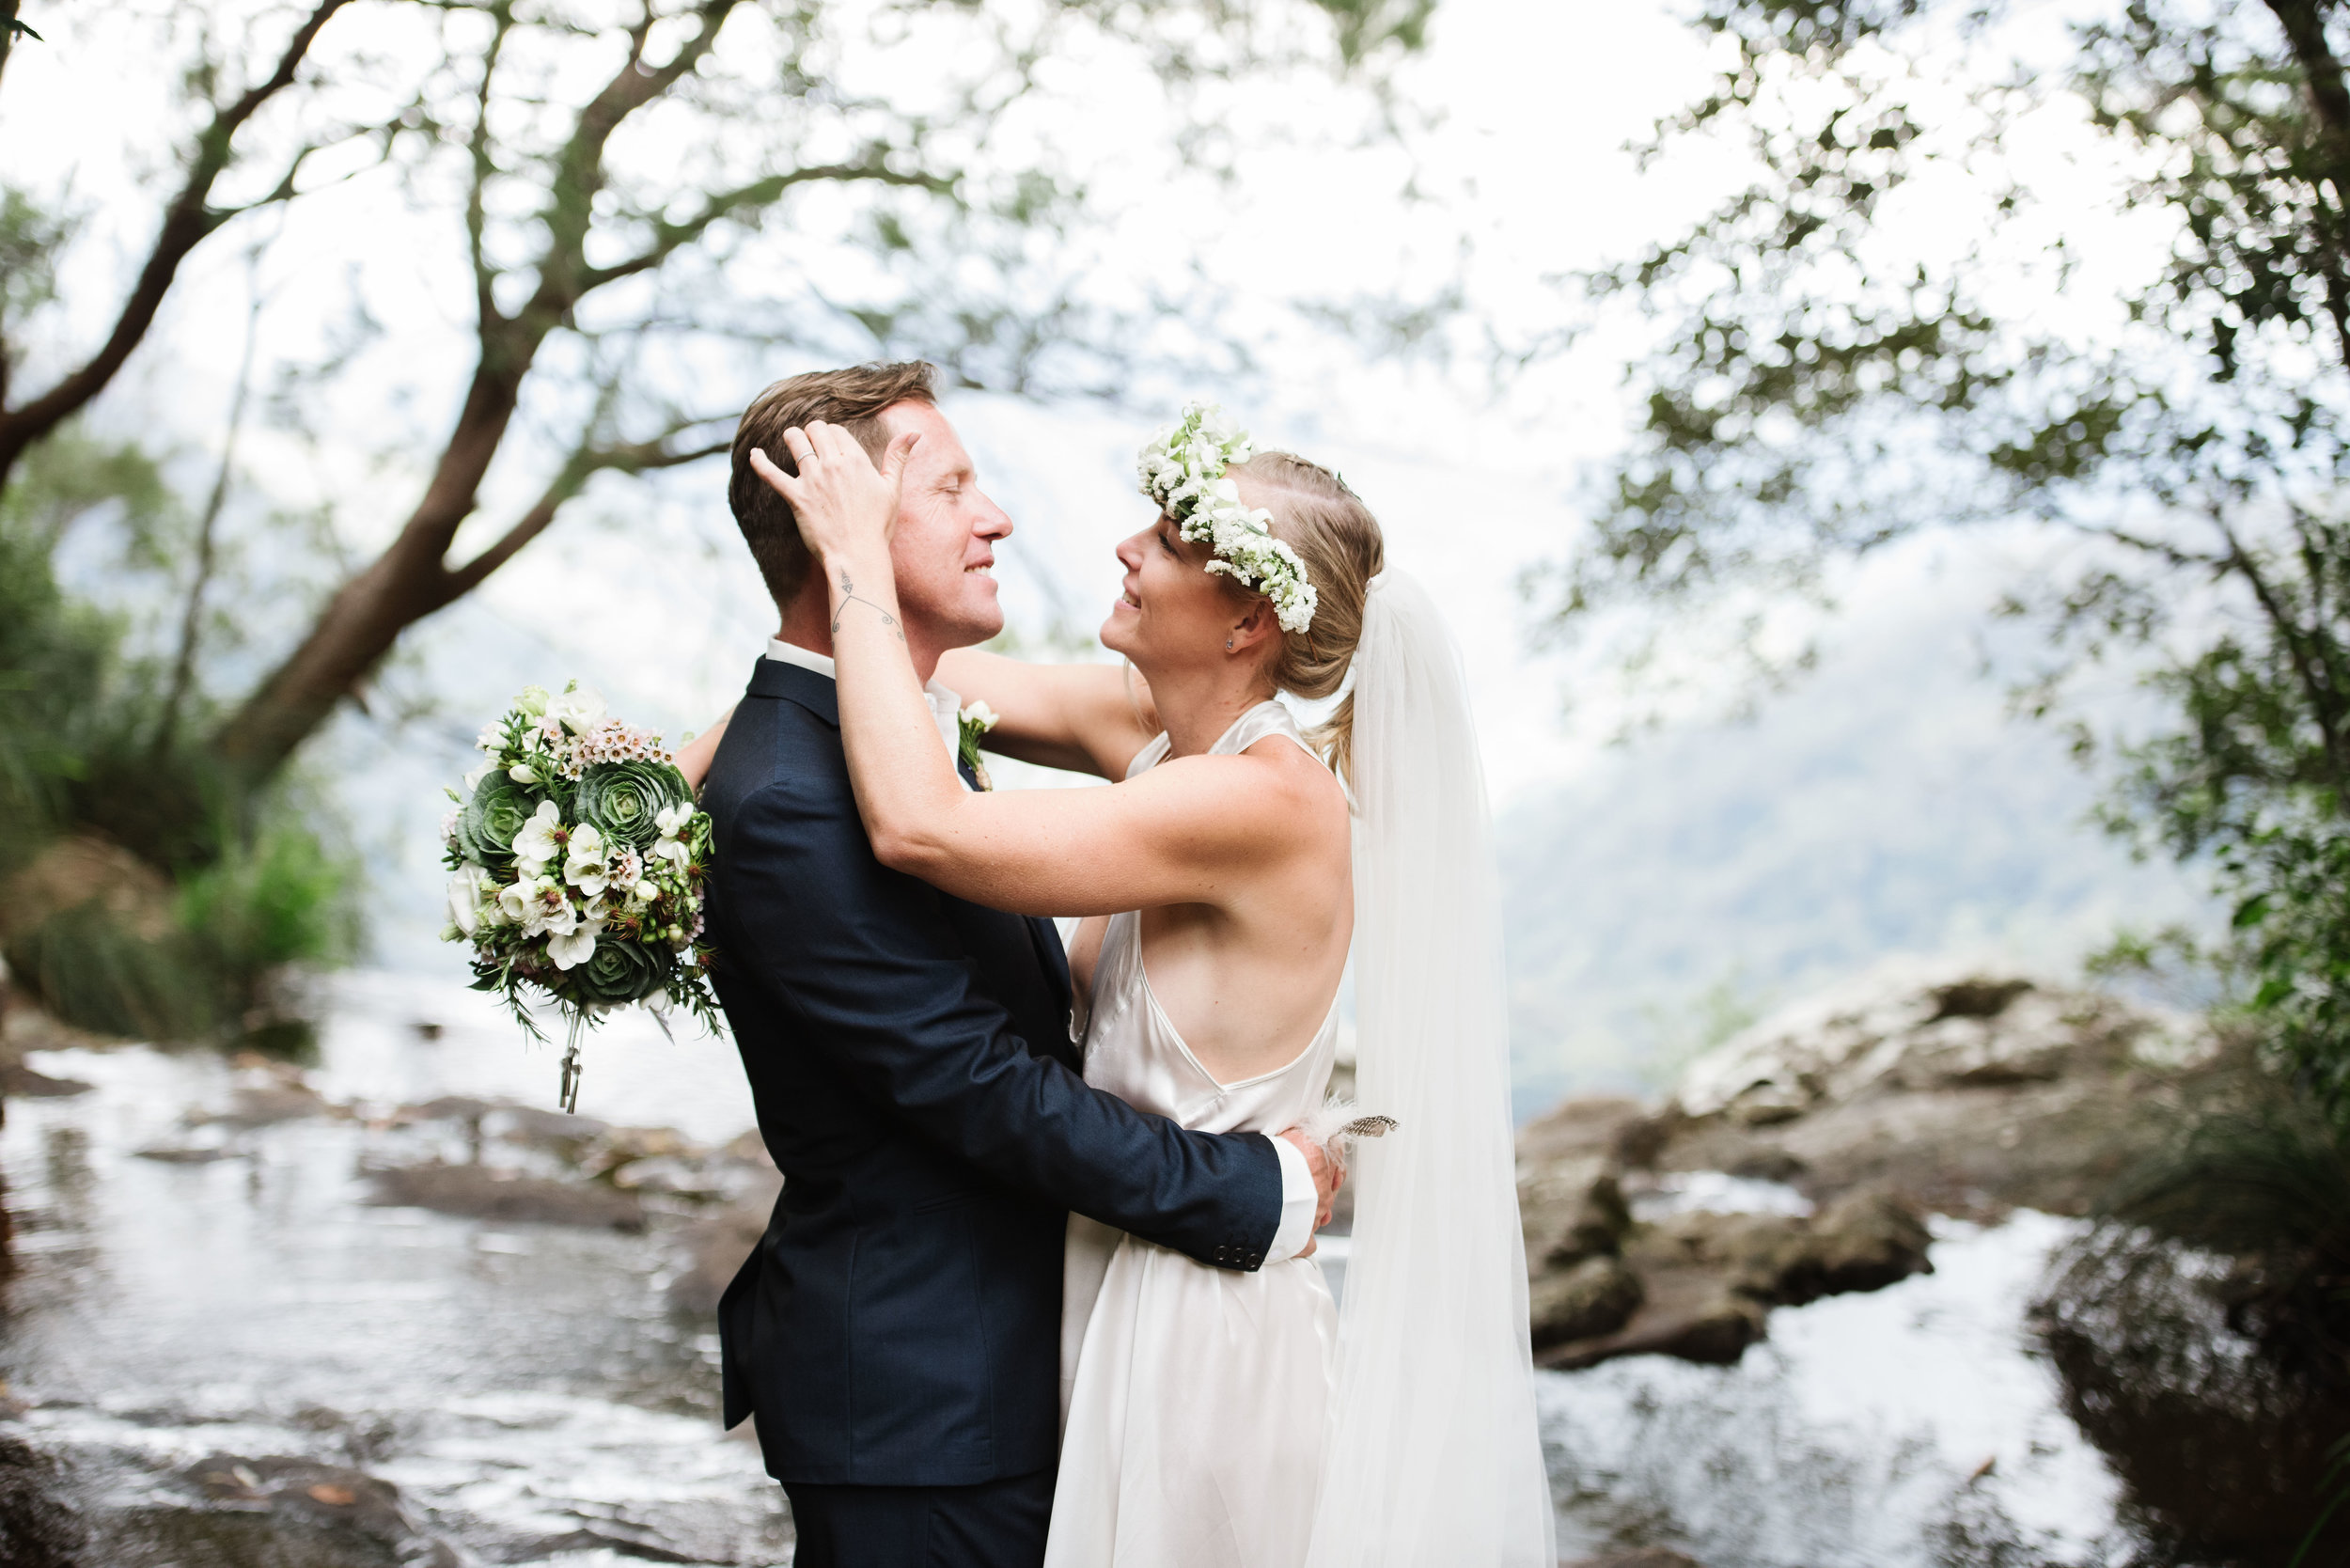 Carla and Luke- wedding photographer, byron bay wedding and family photographer, tweed heads wedding and family photography-275.jpg